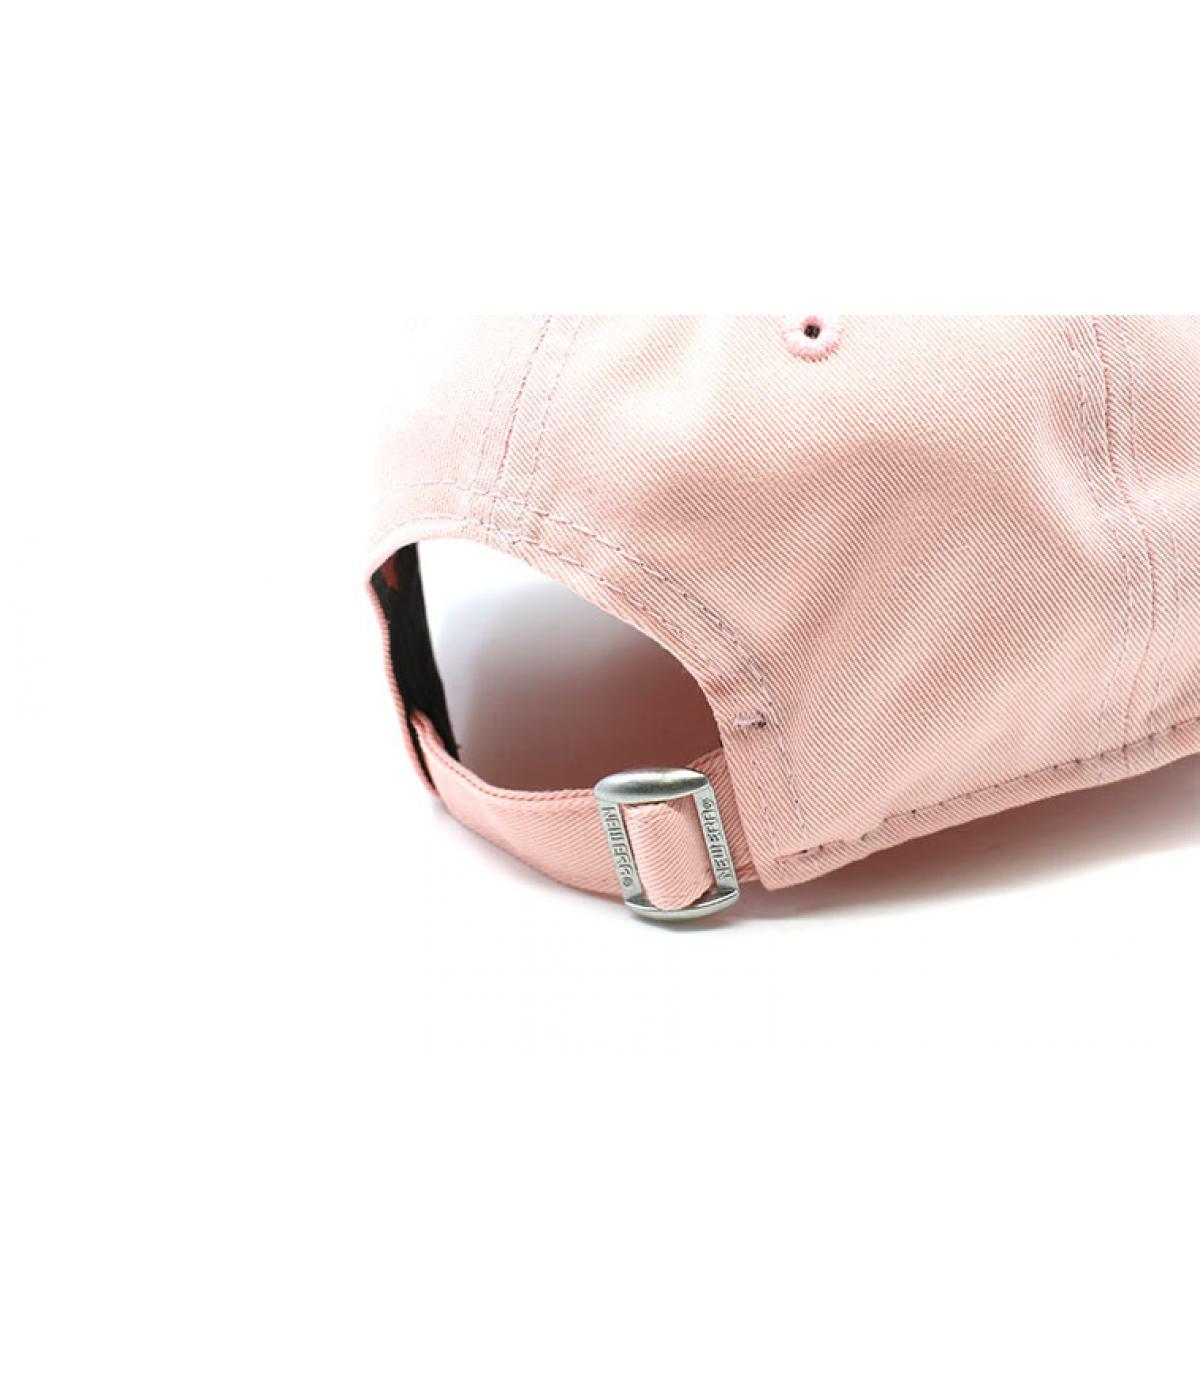 Details Cap Wmns League Ess LA 9Forty pink - Abbildung 5